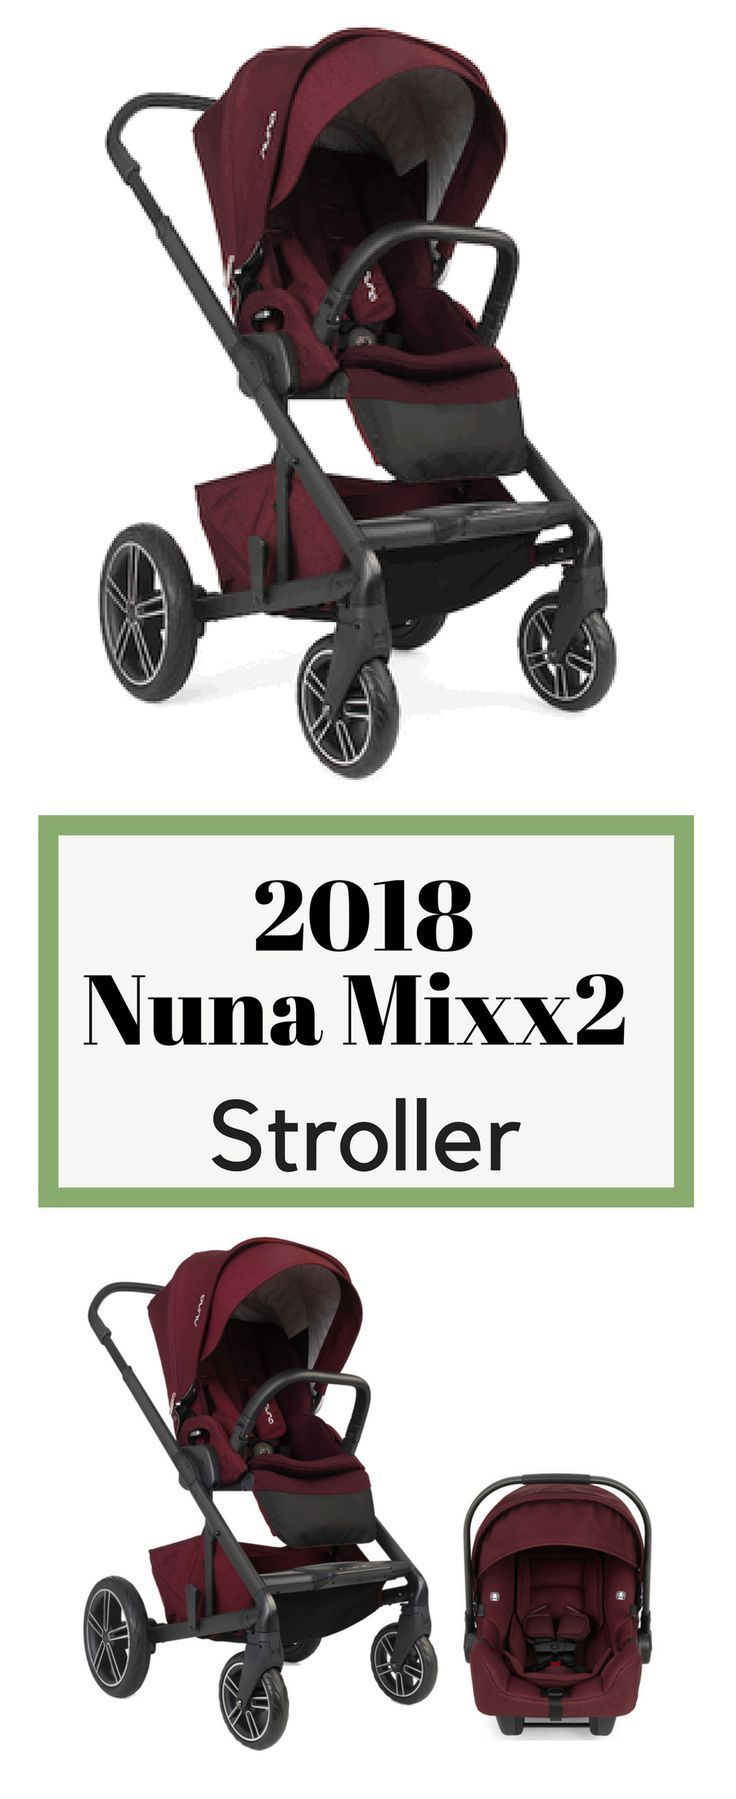 The 2018 Nuna Mixx2 Three Mode Stroller Best baby travel